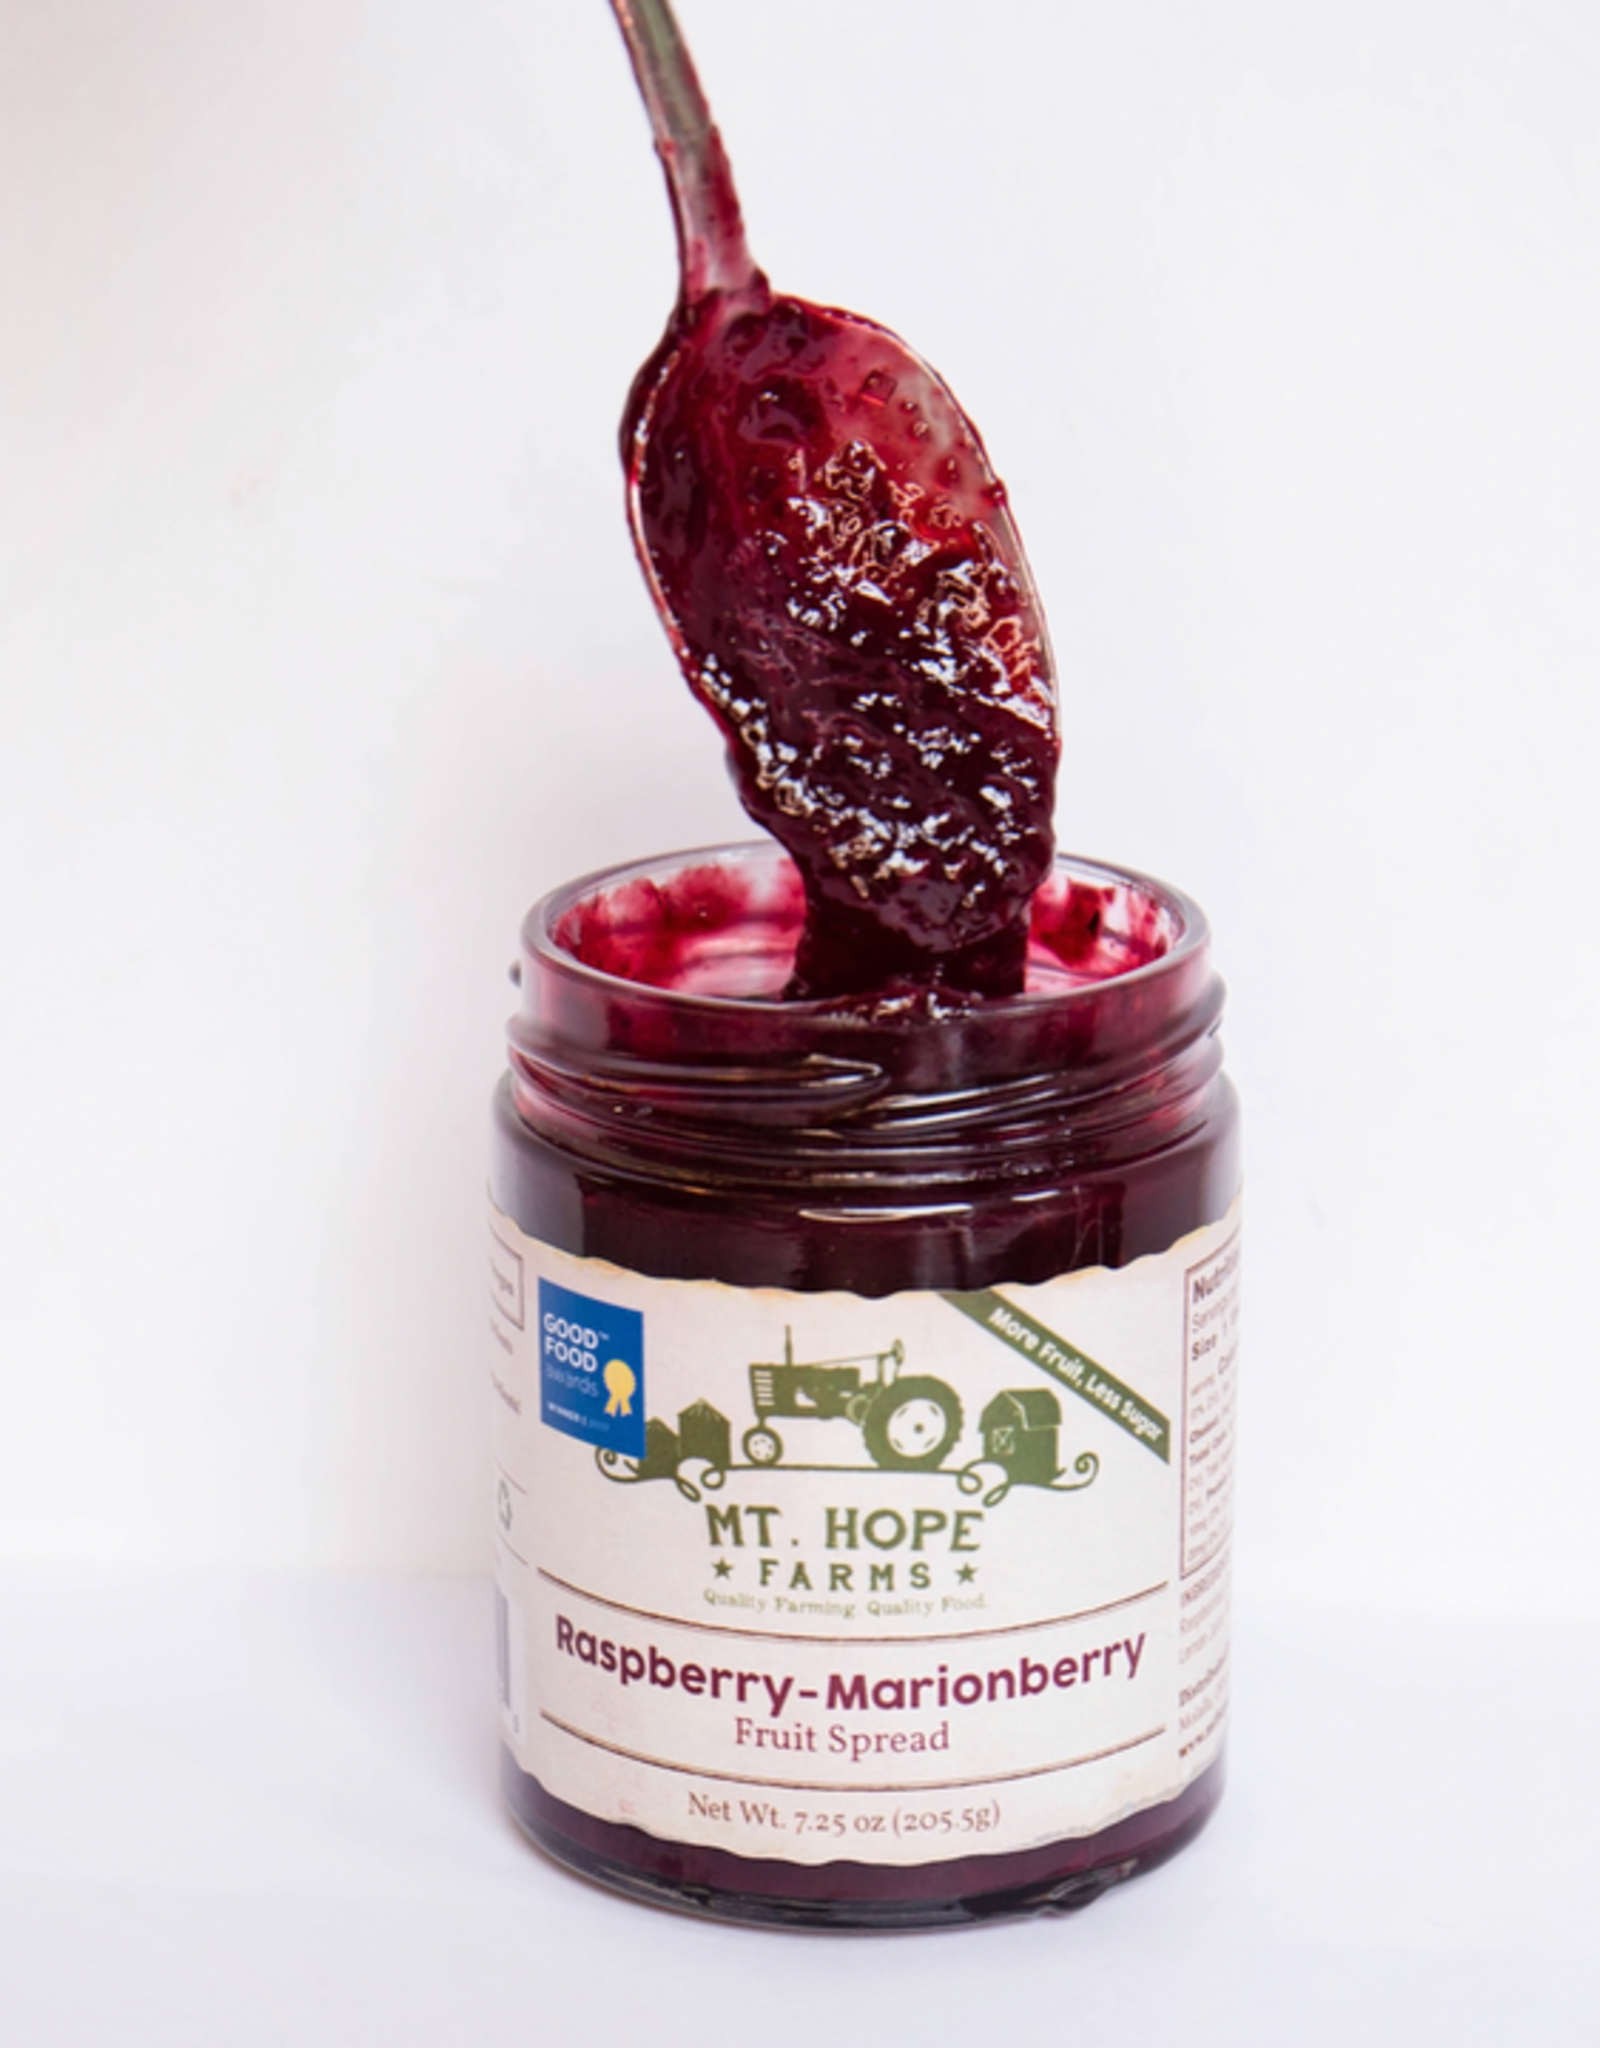 Raspberry-Marionberry Fruit Spread